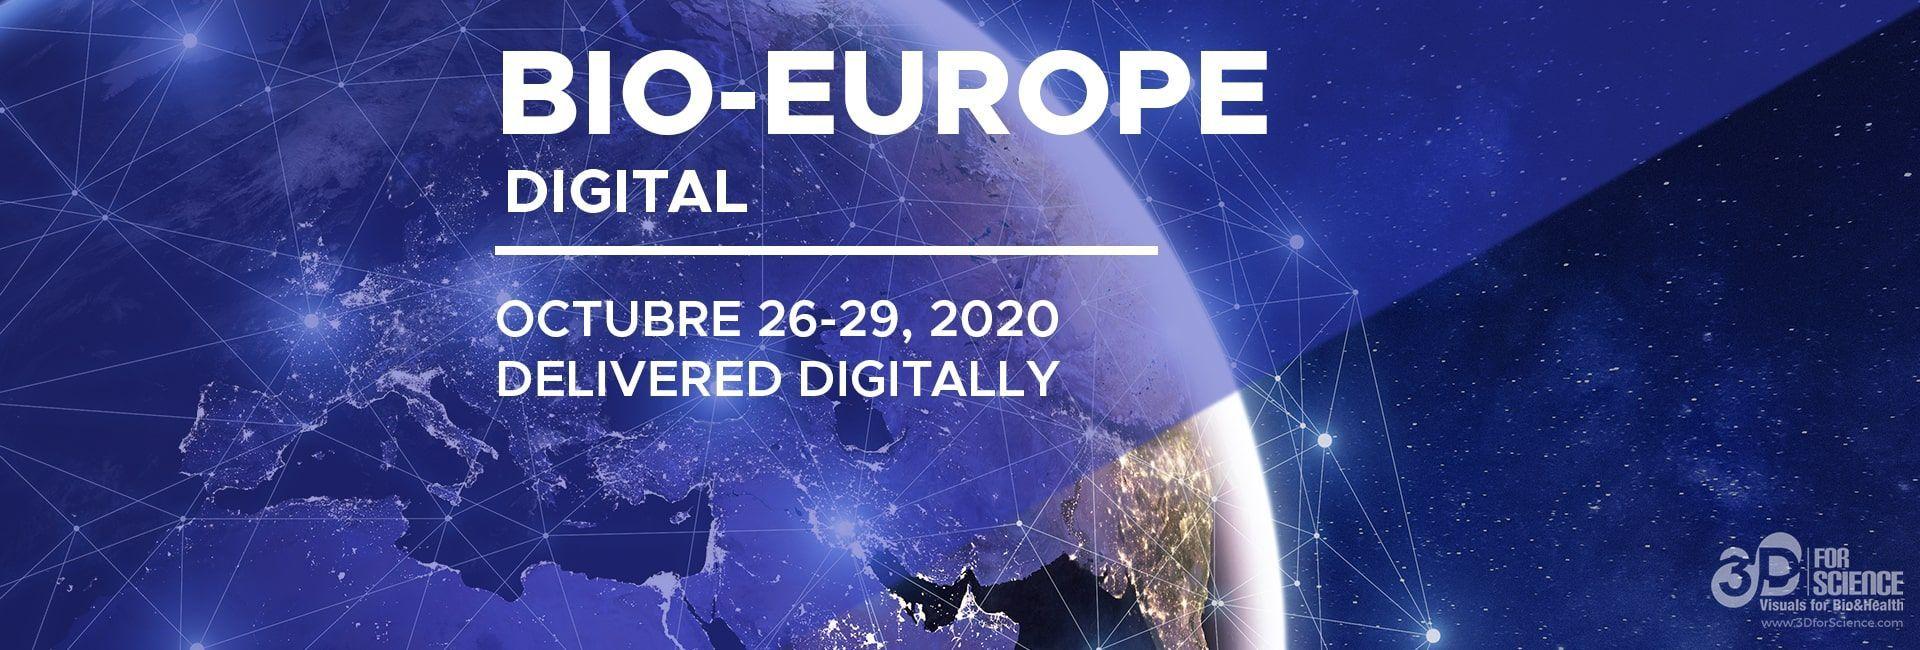 Bio-Europe-Digital